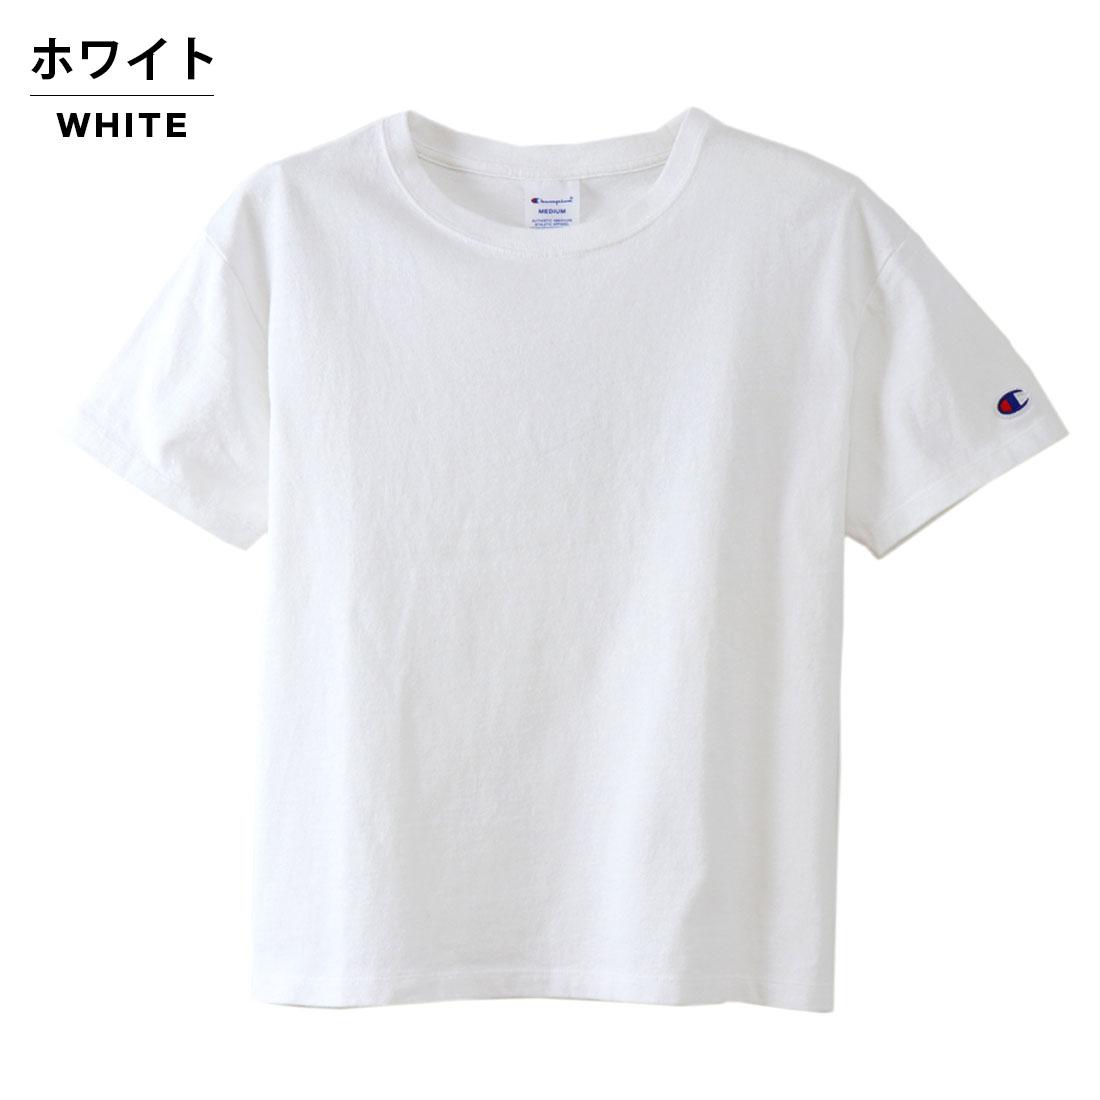 Champion チャンピオン レディース Tシャツ カットソー 無地 人気 シンプルWomens クルーネックTシャツ(M L)【メール便可】